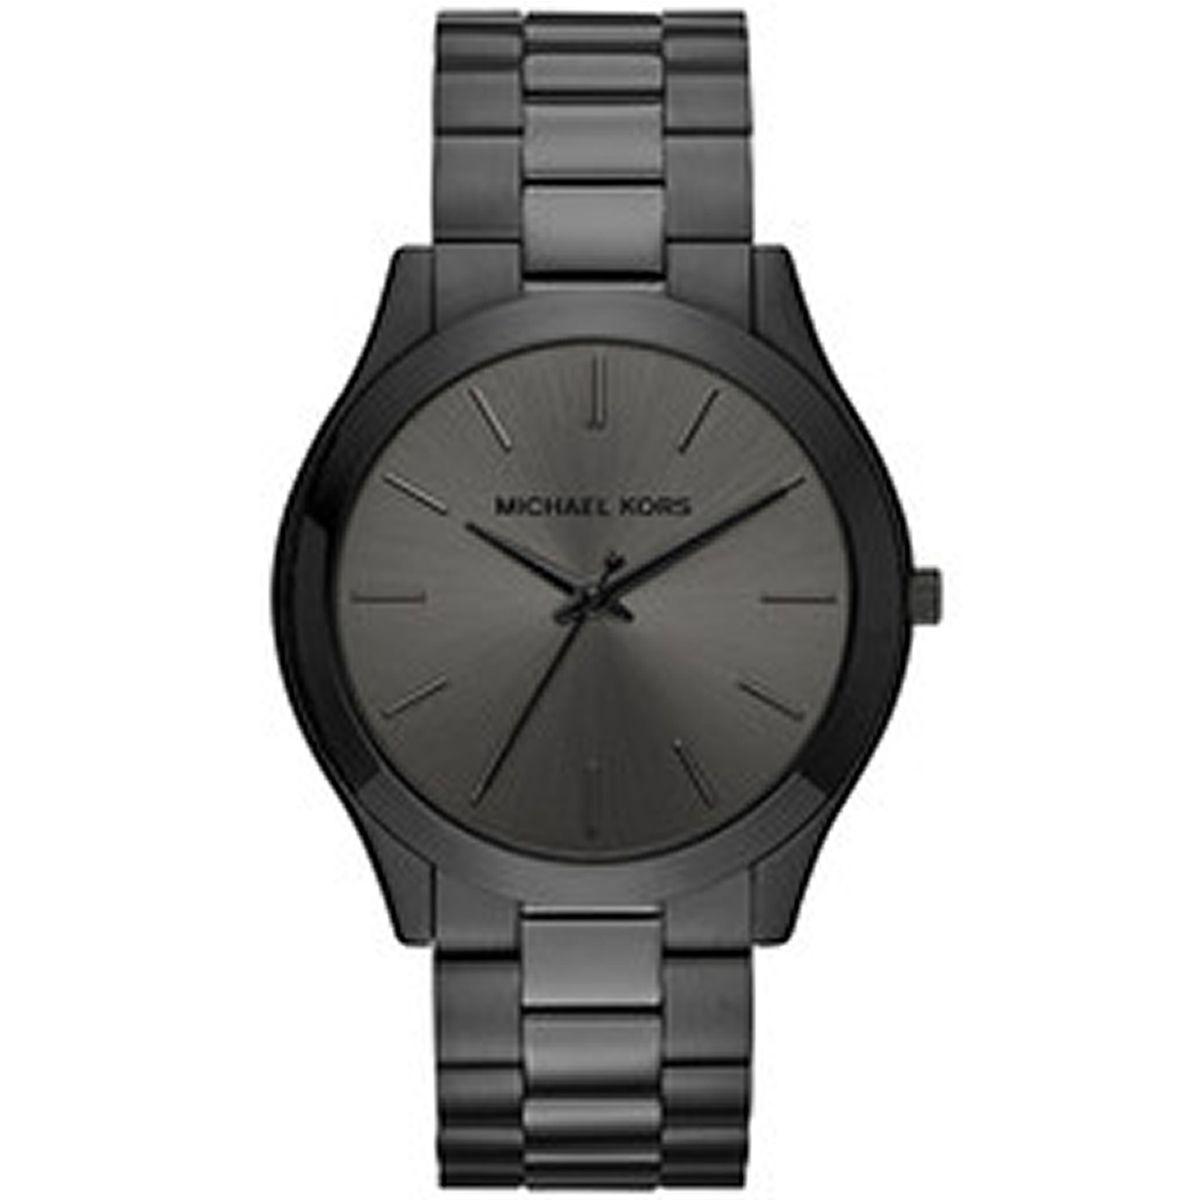 514d13eafe1c5 Michael Kors Watches - Macy s